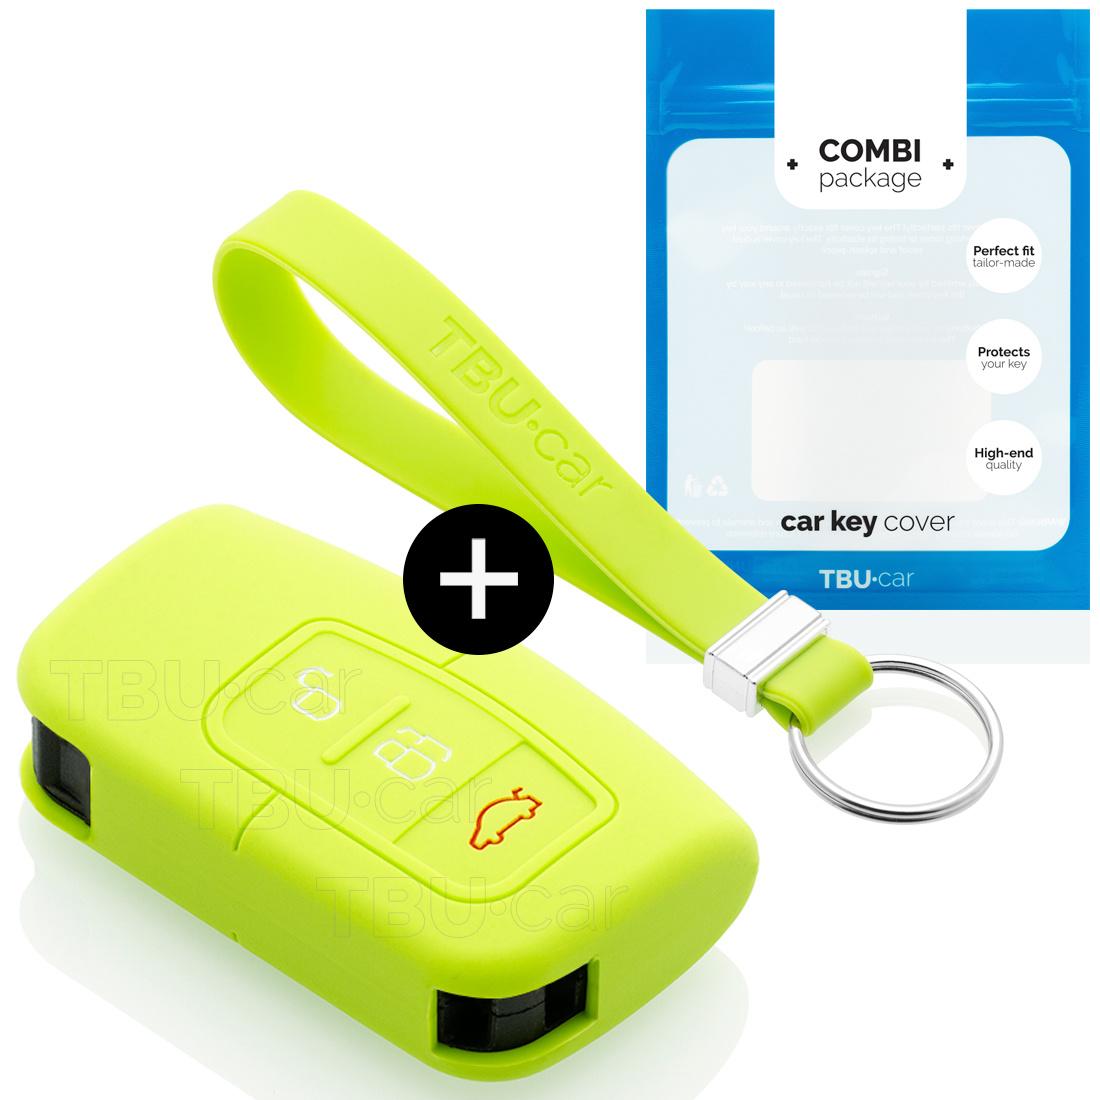 TBU car Autoschlüssel Hülle für Ford 3 Tasten (Keyless Entry) - Schutzhülle aus Silikon - Auto Schlüsselhülle Cover in Lindgrün